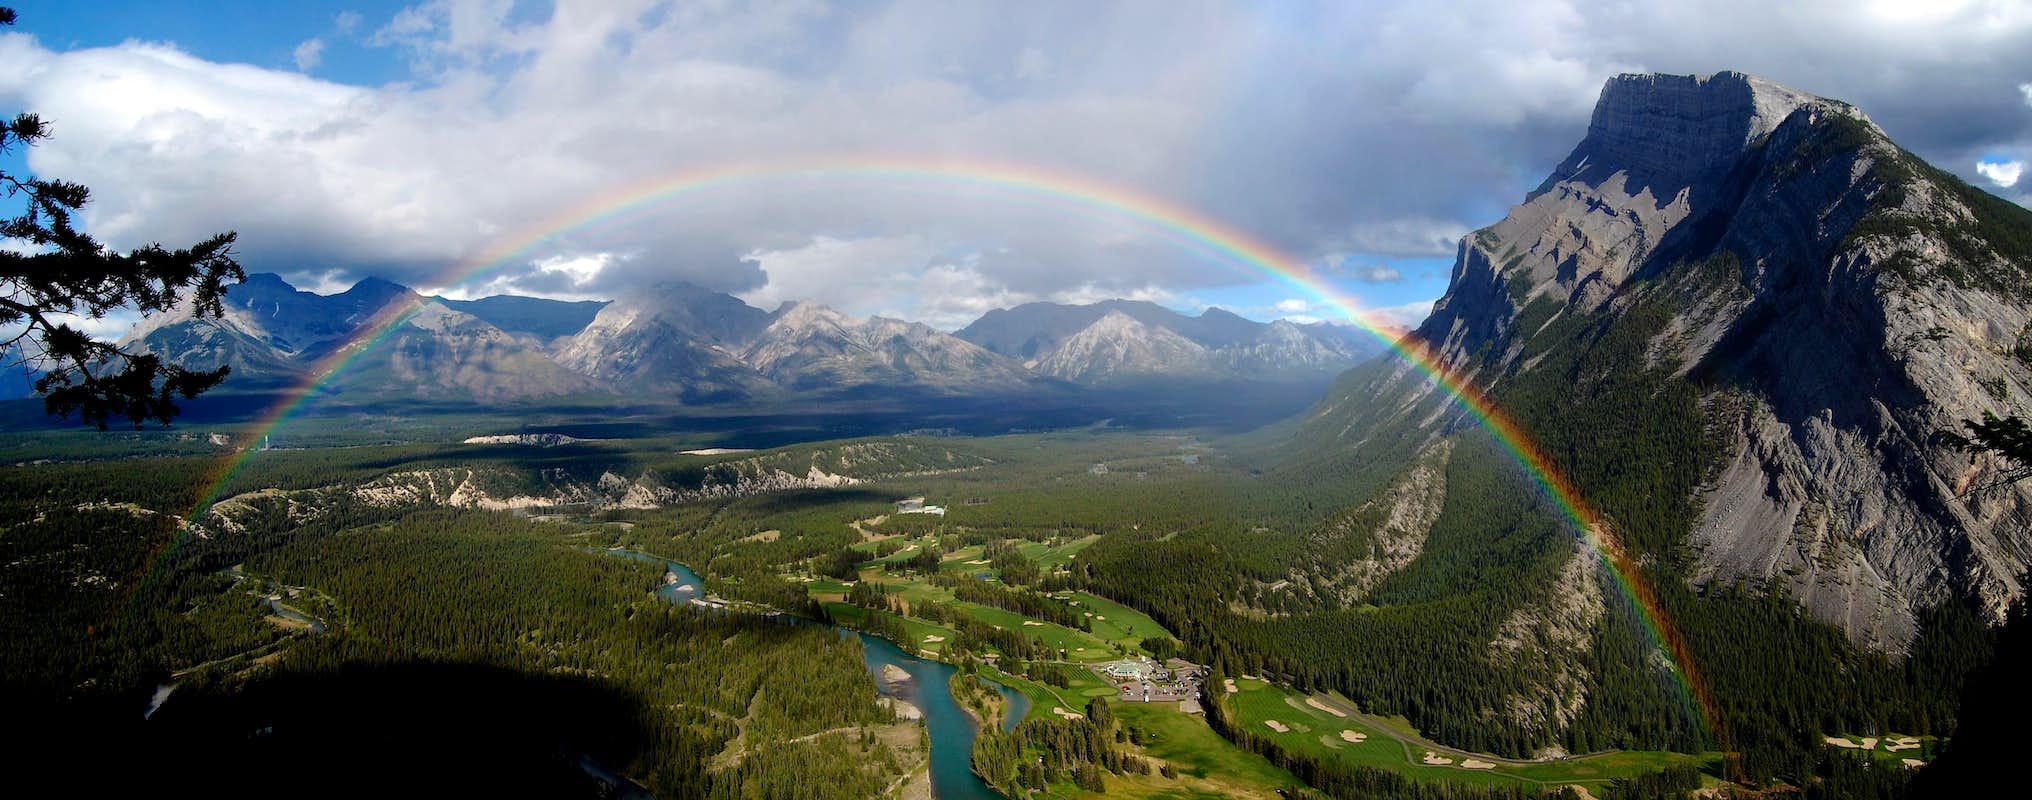 2008-07-30 - 05 - Banff